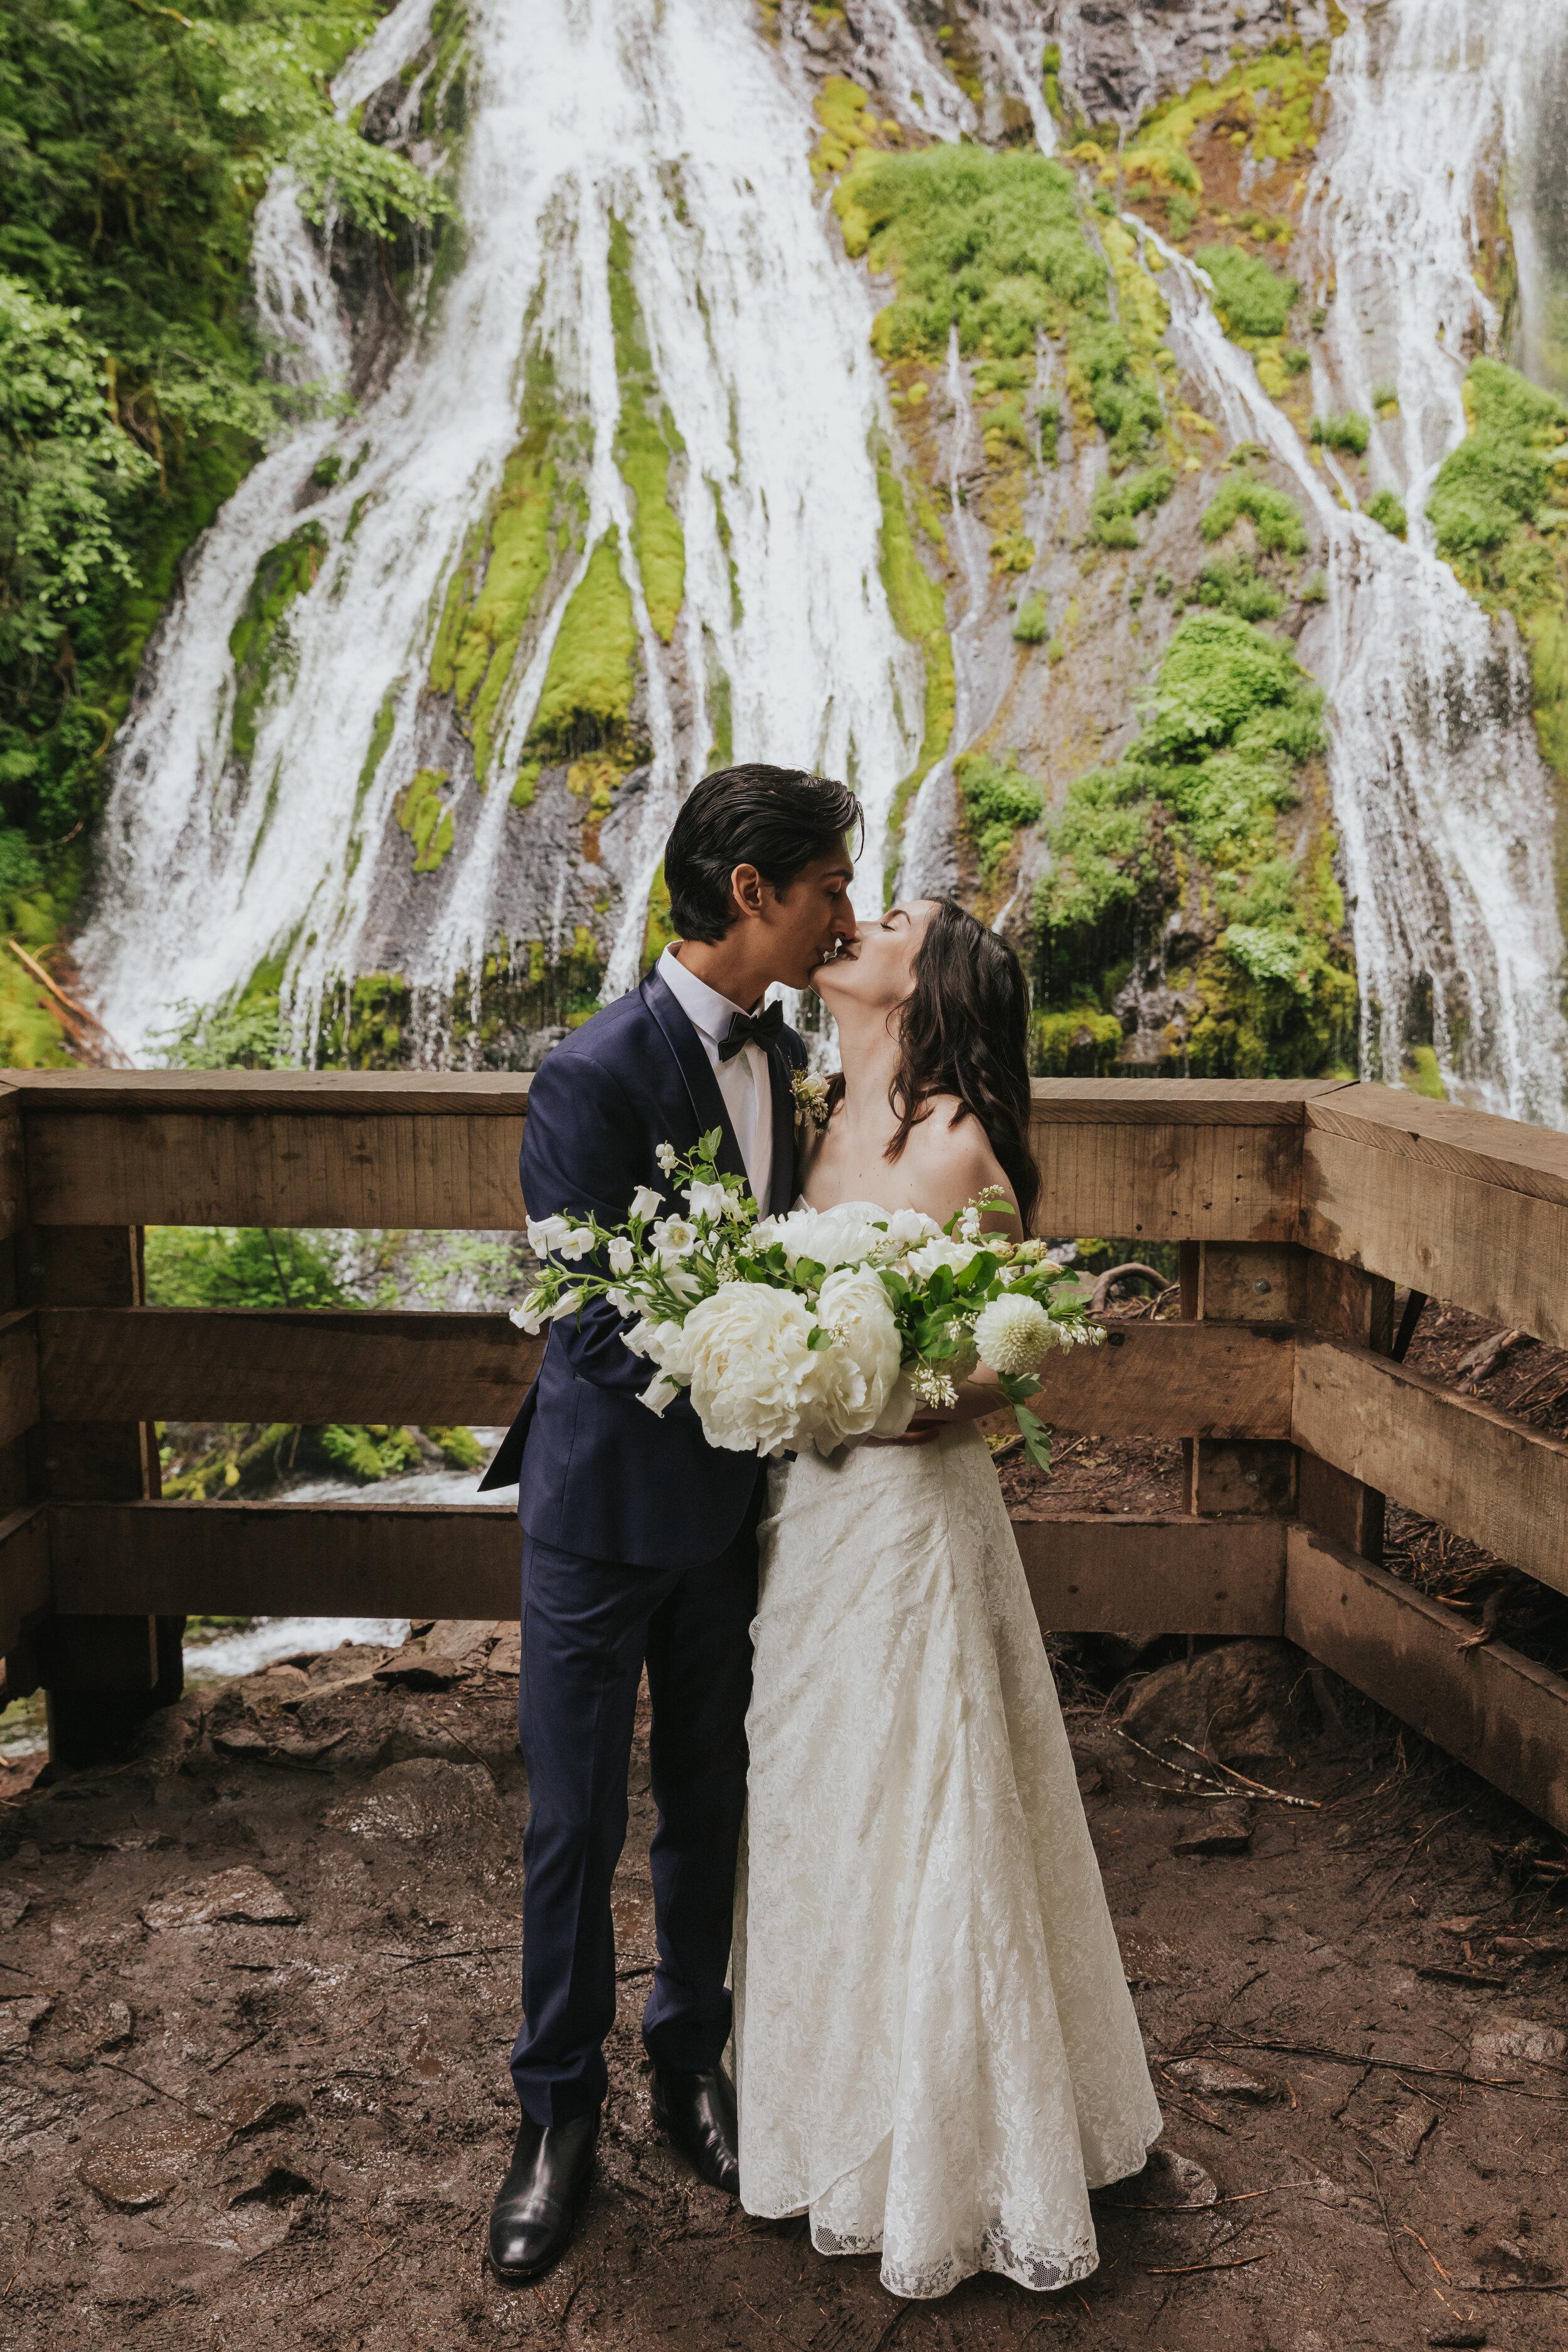 Marissa-Solini-Photography-Panther-Creek-Falls-Elopement